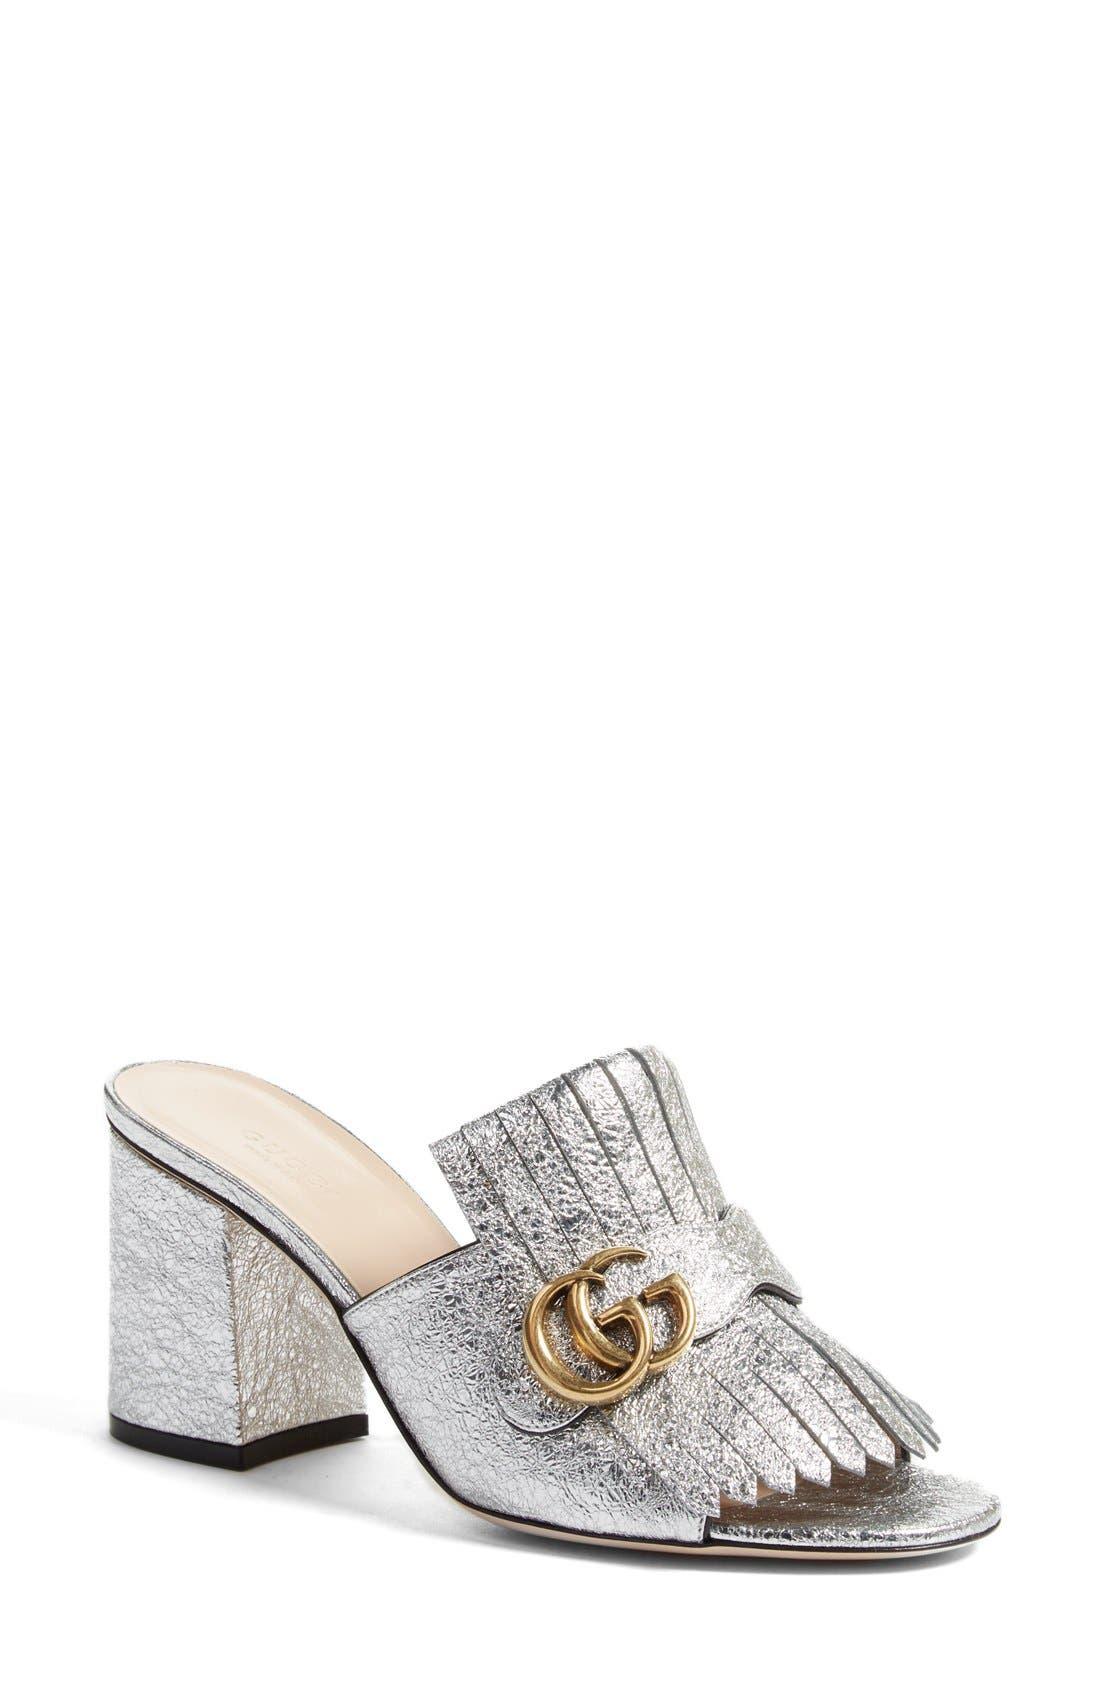 Alternate Image 1 Selected - Gucci GG Marmont Peep Toe Kiltie Mule (Women)